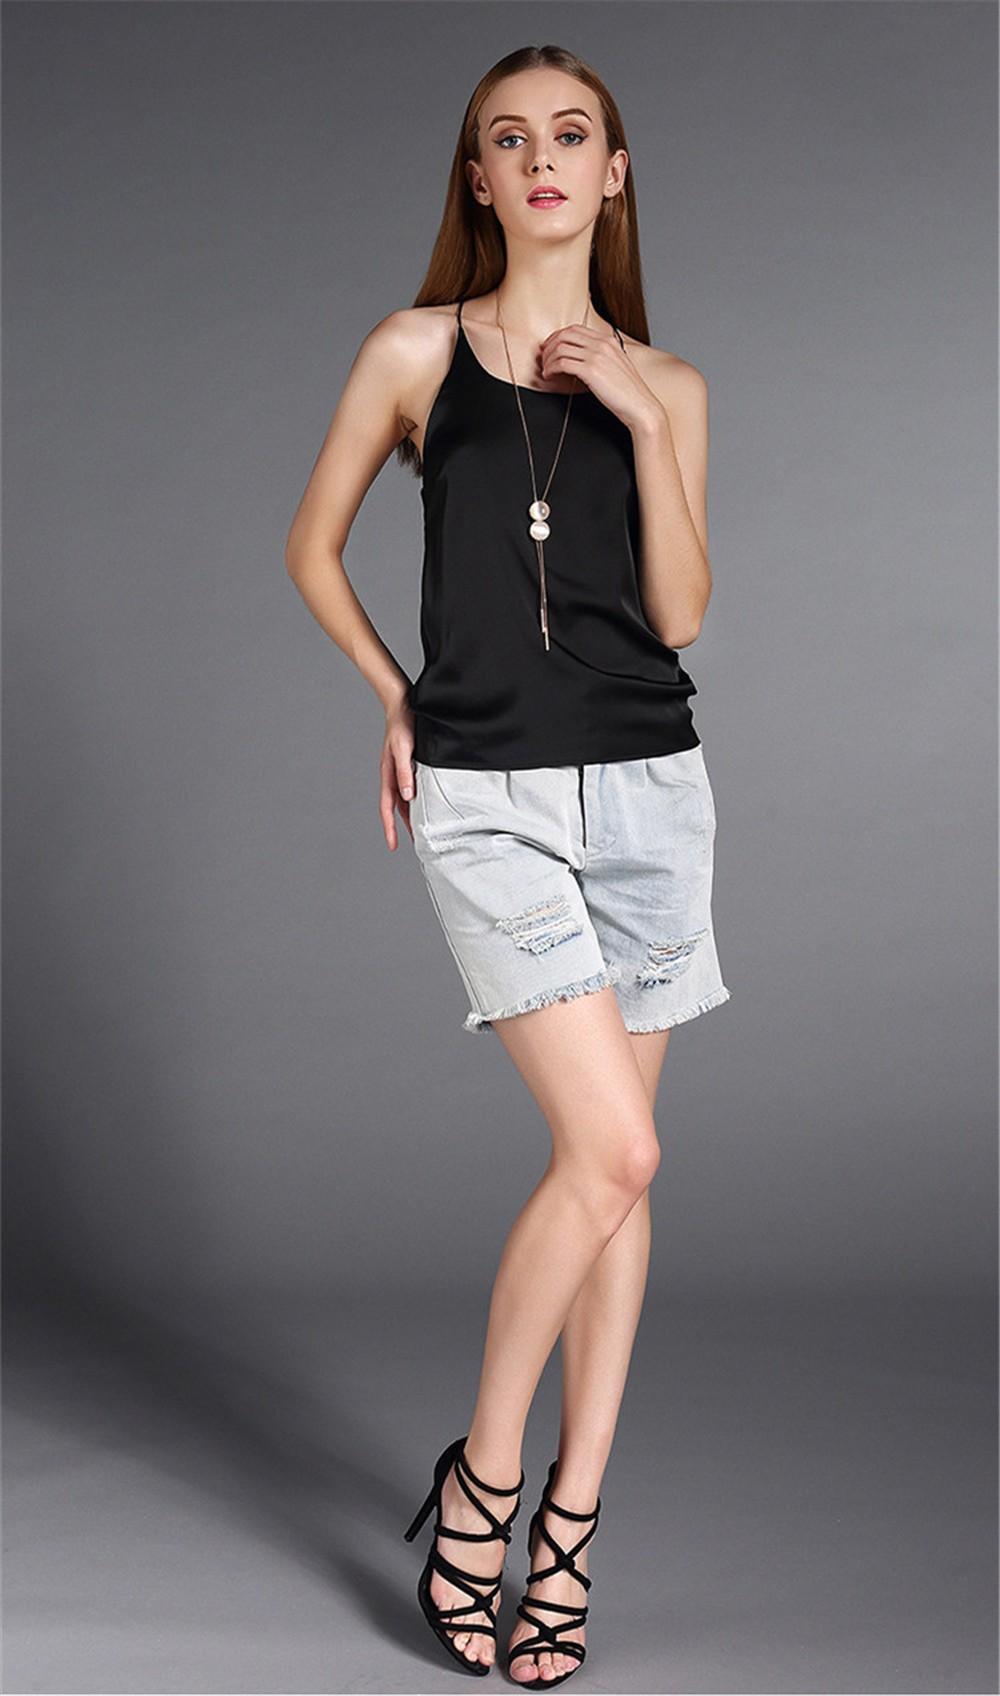 Plus Size S-4XL Multiple Women Tank Tops Brand Silk Blending Sleeveless Tshirt Women Female Shirt Smooth Blouse Blusas Femininas (9)